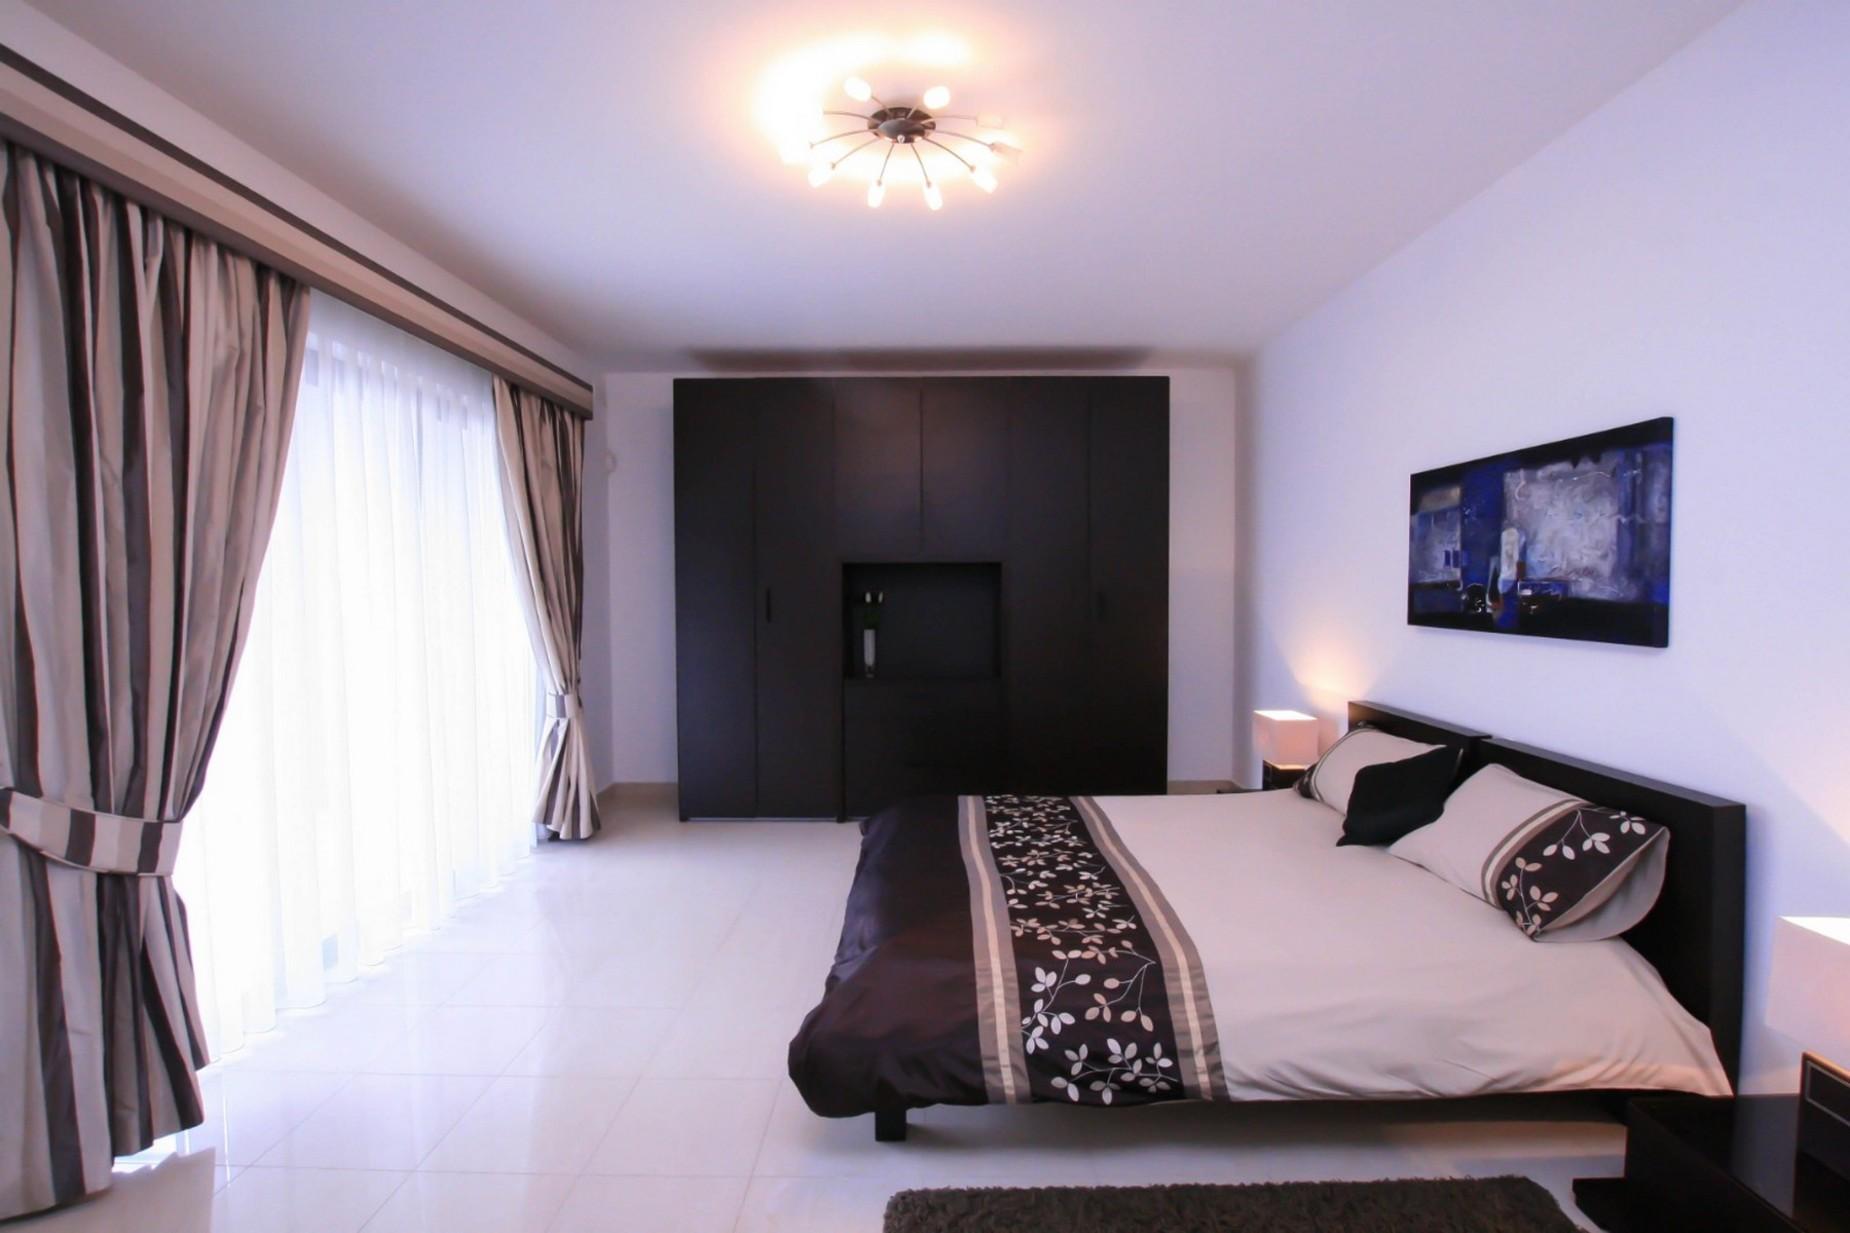 3 bed Maisonette For Rent in Swieqi, Swieqi - thumb 10